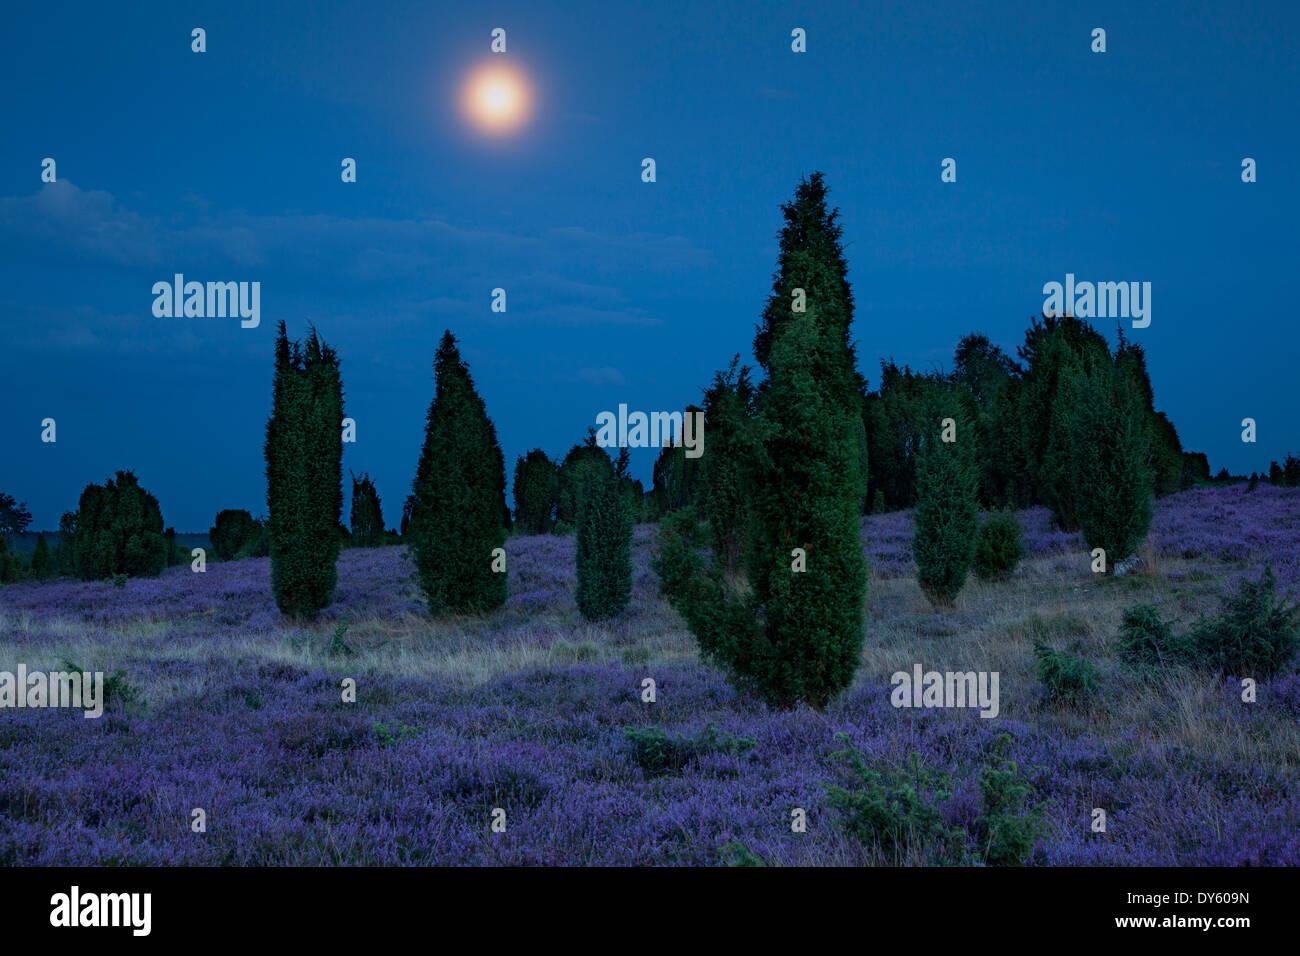 170dfbfbc0 Juniper and heather at moonlight, Lueneburger Heide, Lower Saxony, Germany